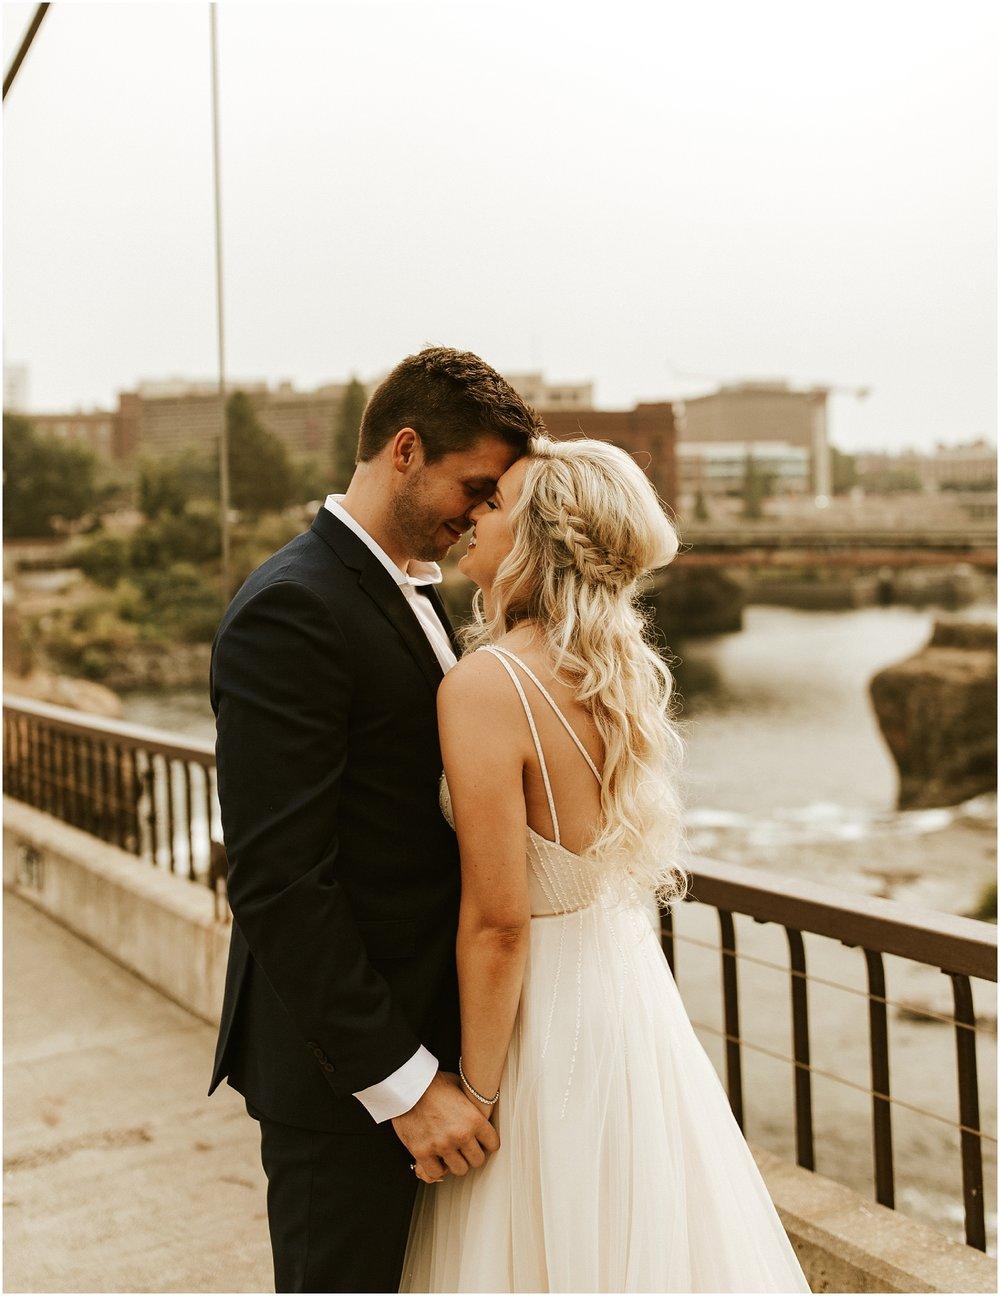 Chateau Rive Spokane Wedding Cassie Trottier Photography1047.jpg